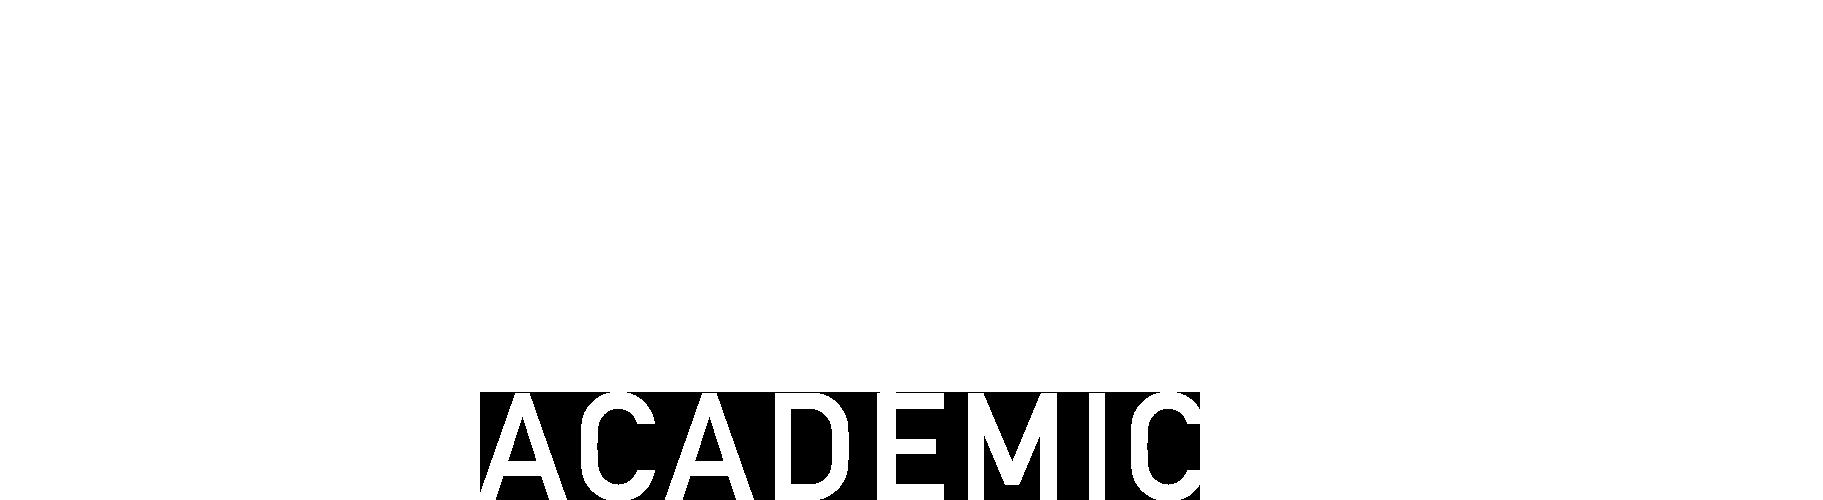 hachette-academic logo